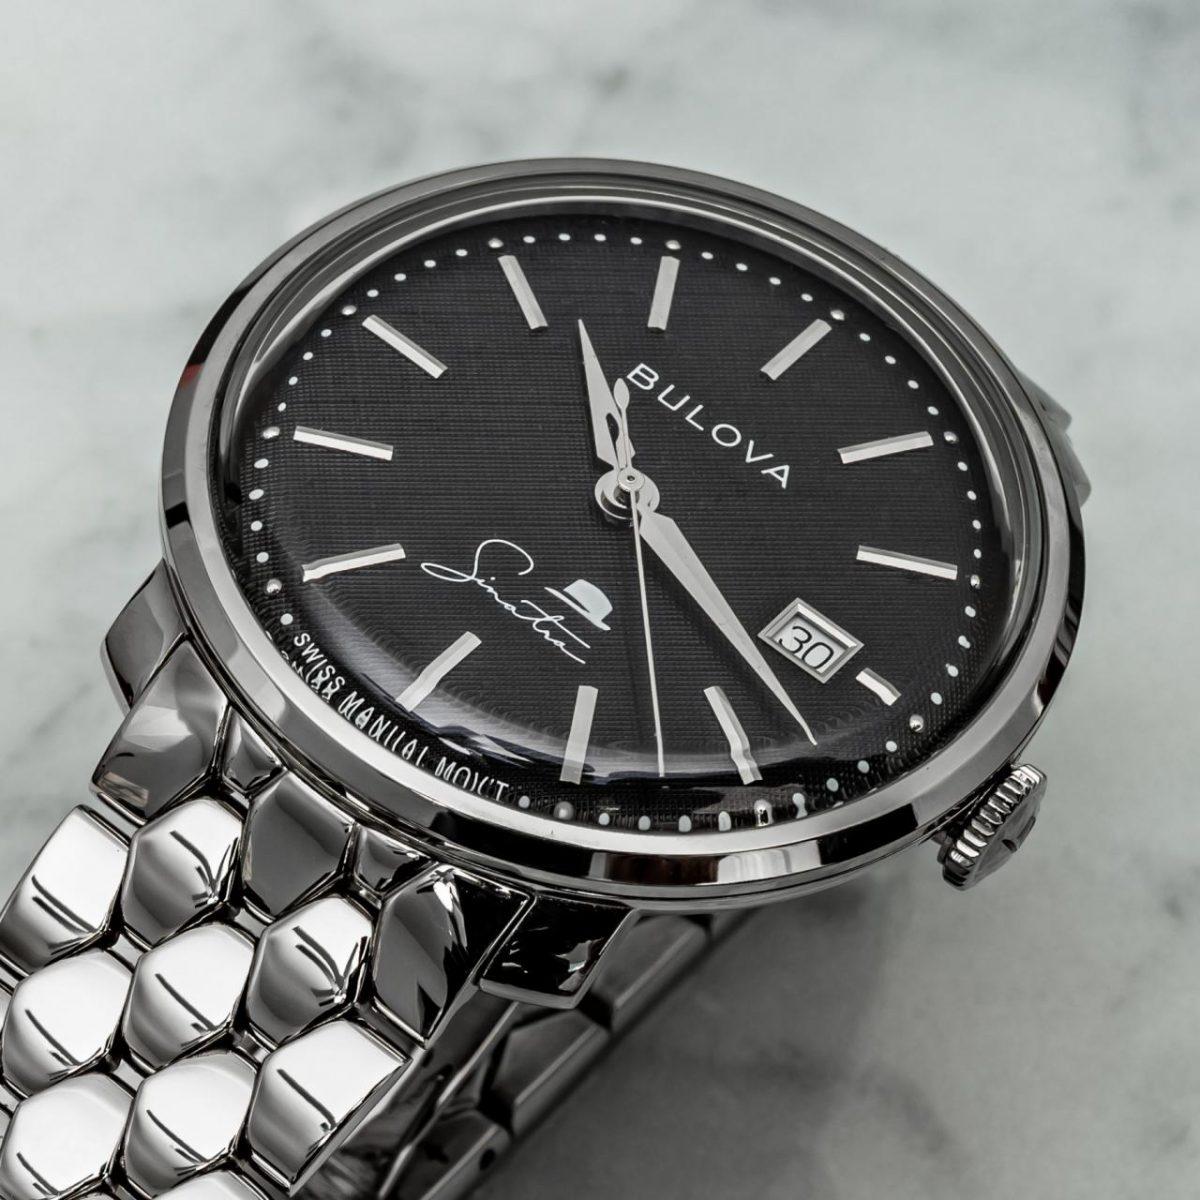 Bulova Frank Sinatra replica Watch Collection